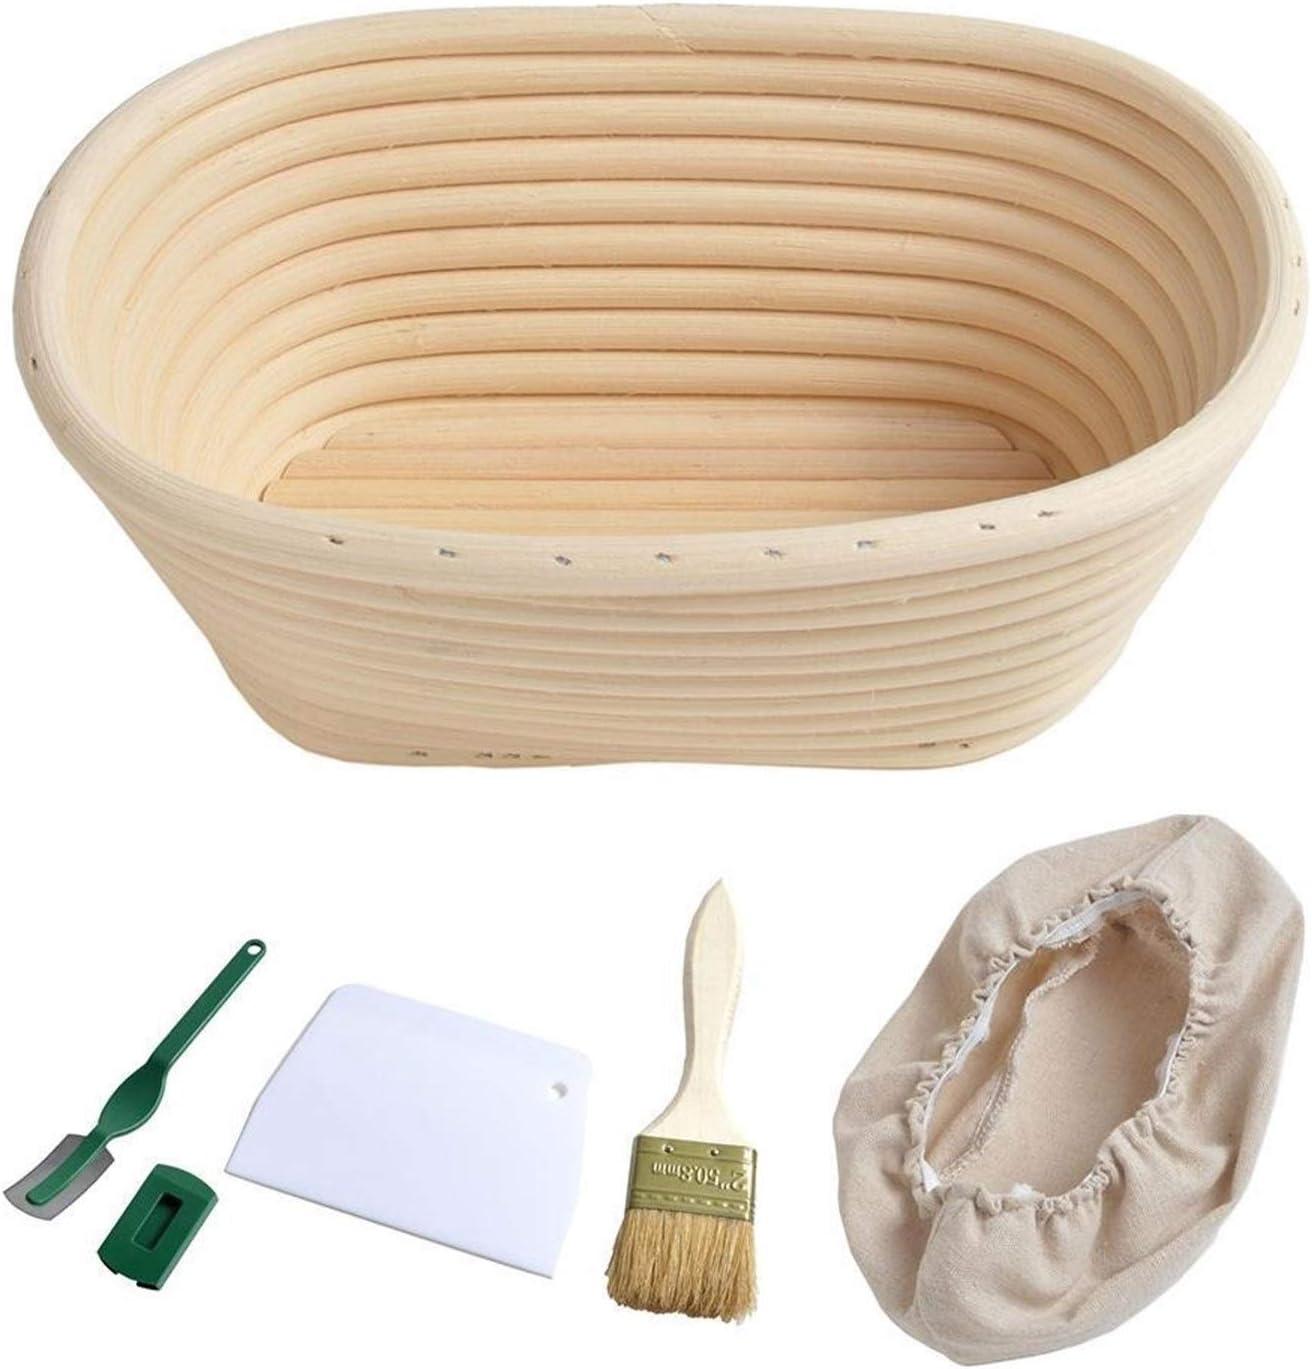 YWSZY Bread latest Proofing Special price Baskets Set Basket Professio